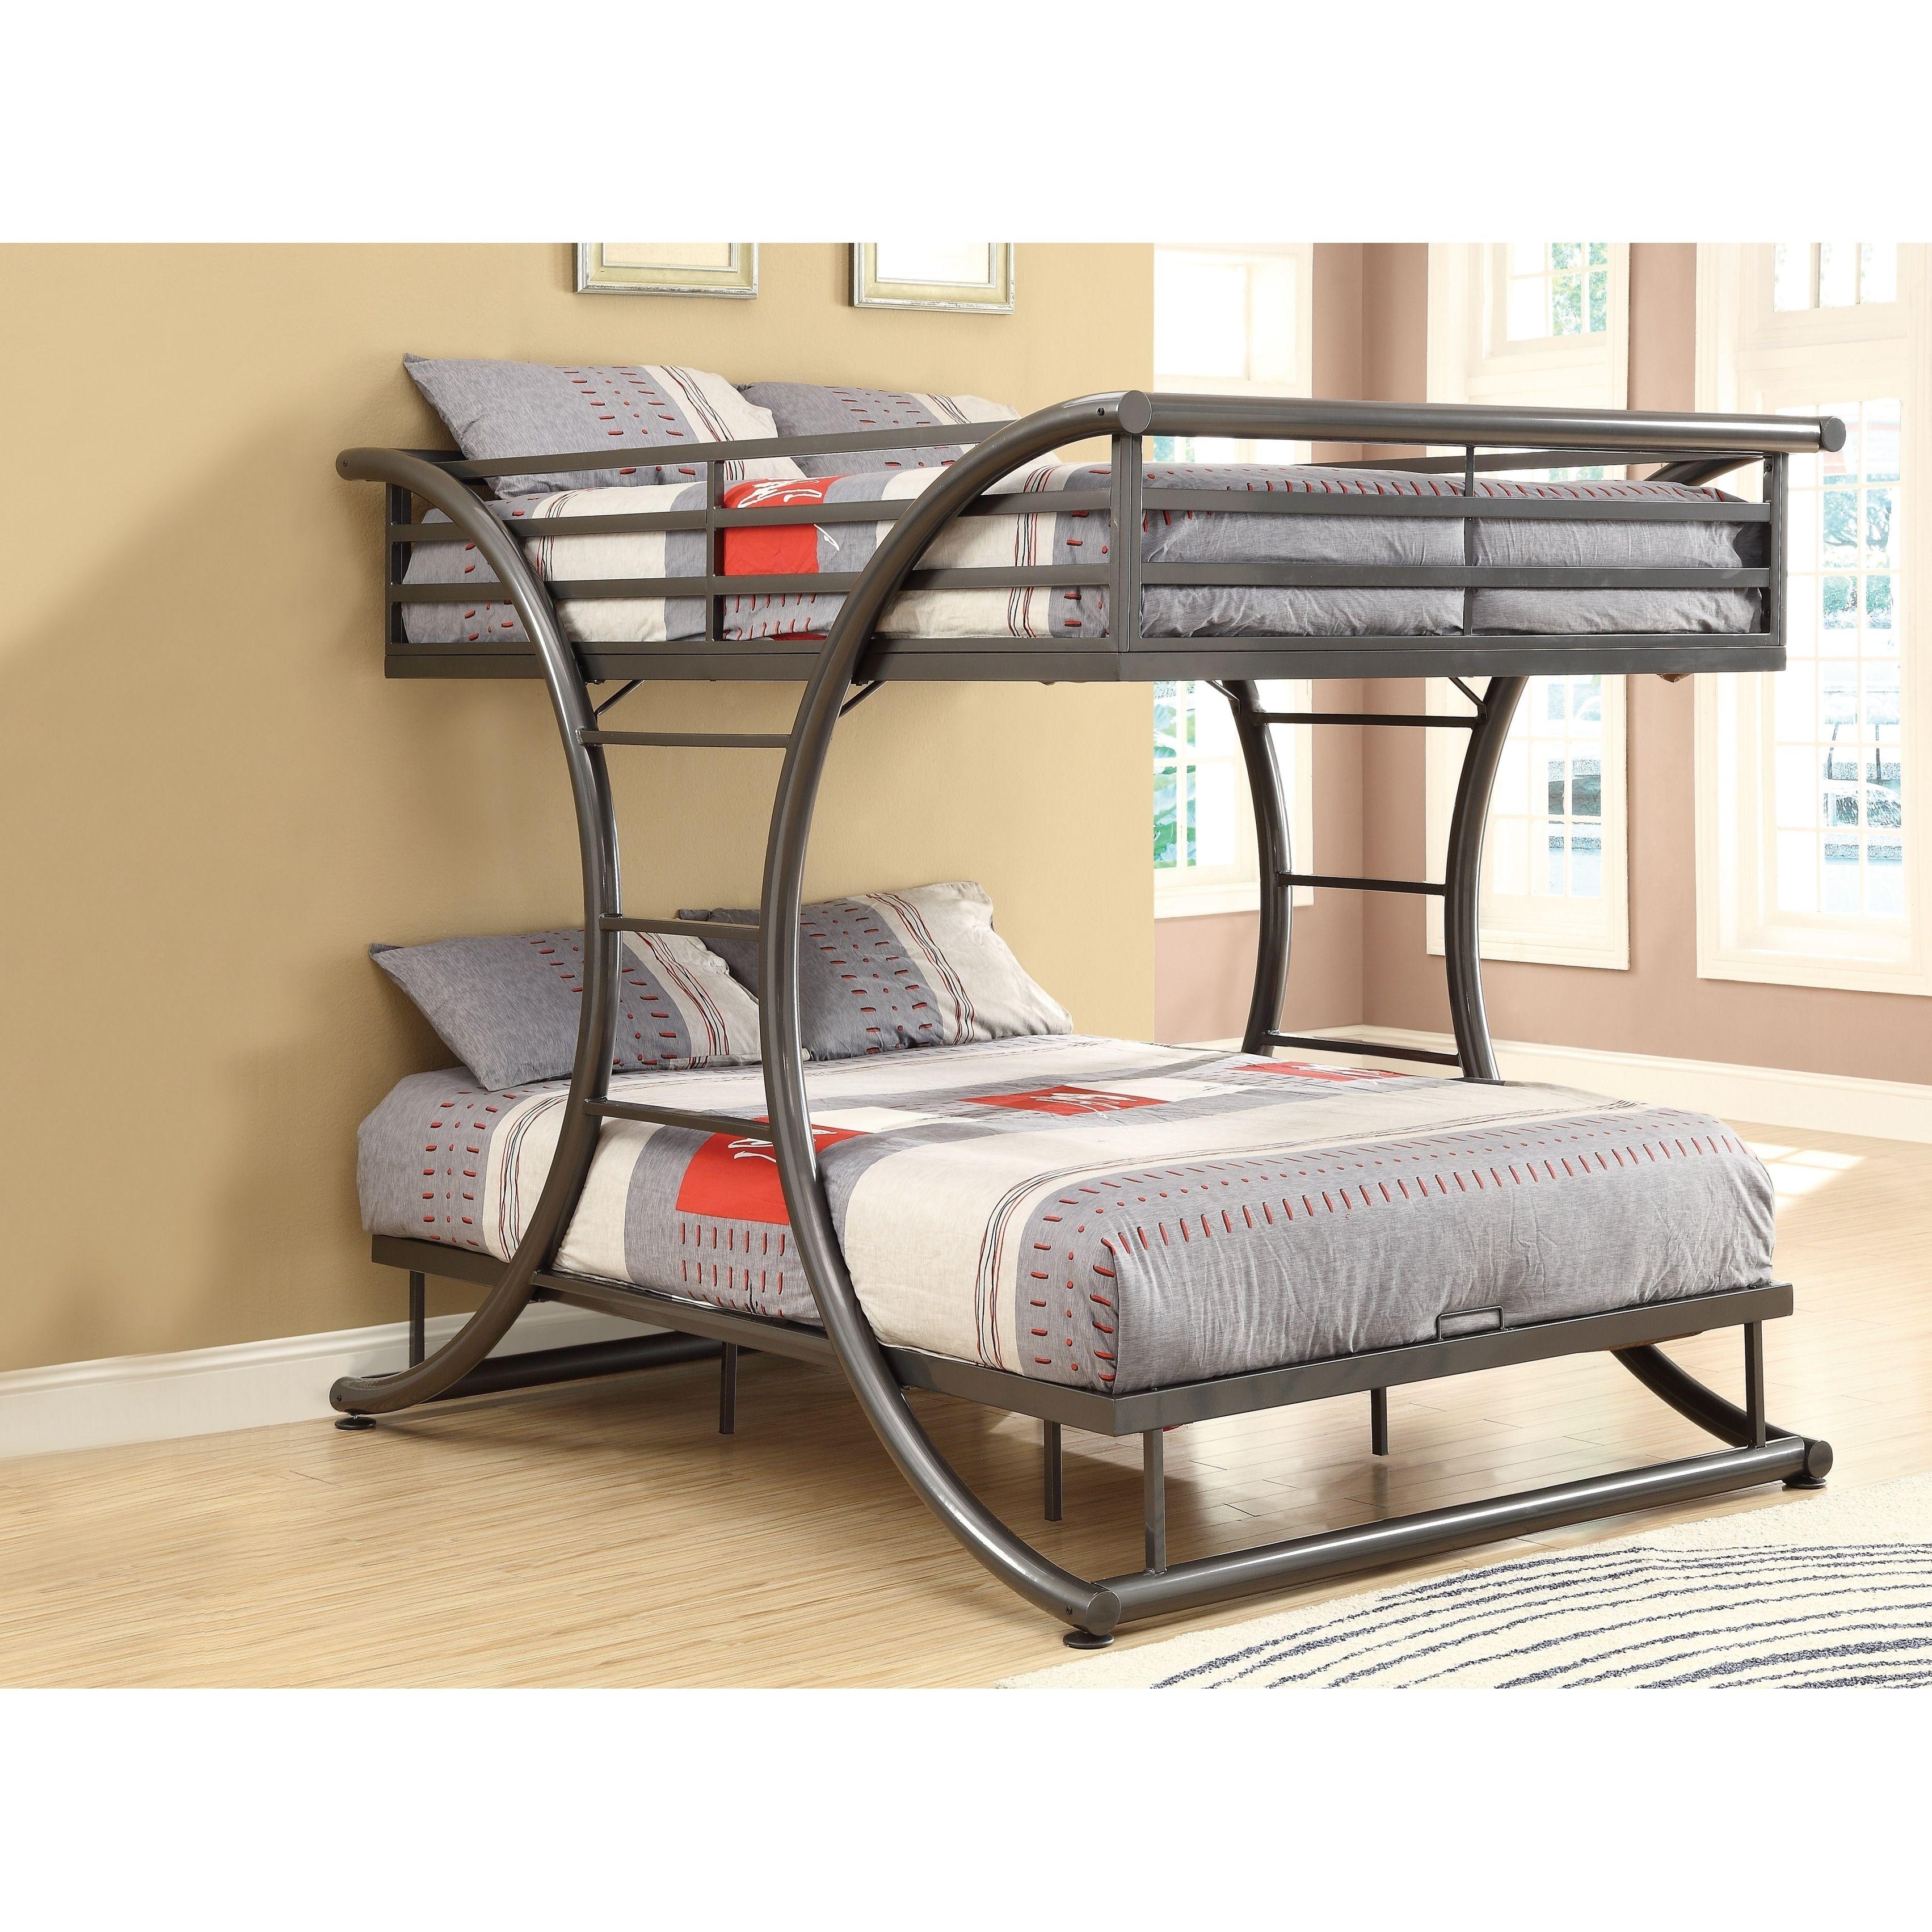 Coaster Stephan Full Over Full Metal Bunk Bed Grey